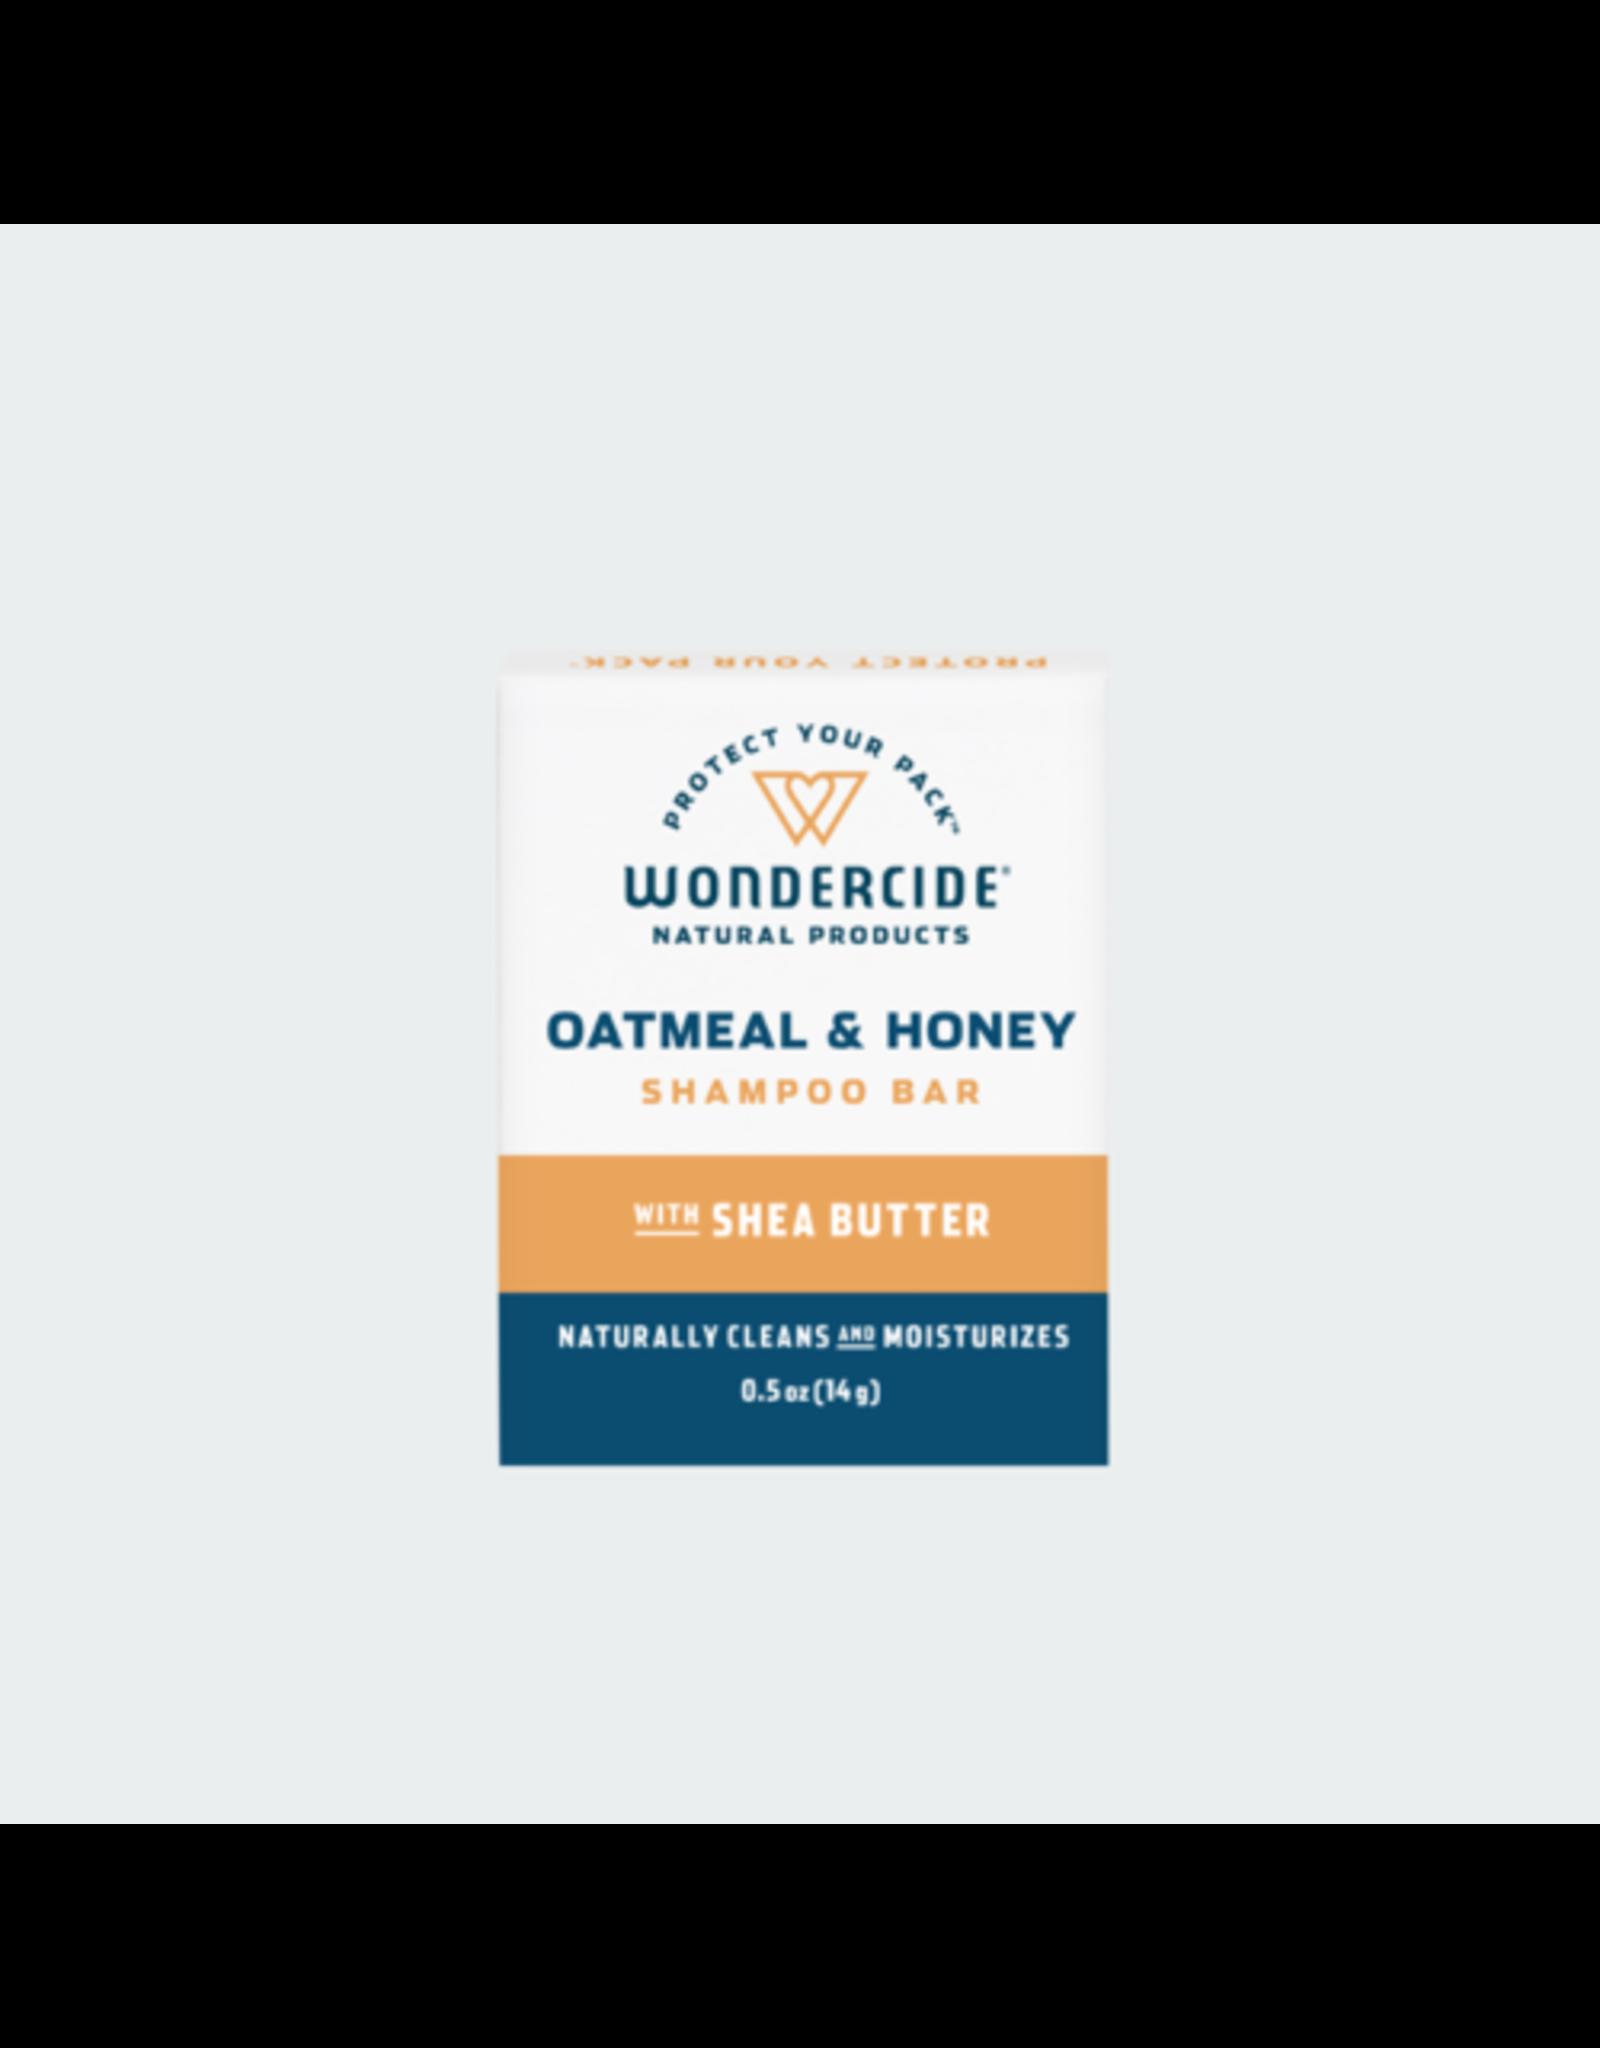 Wondercide Wondercide Oatmeal & Honey Shampoo Bar .5oz